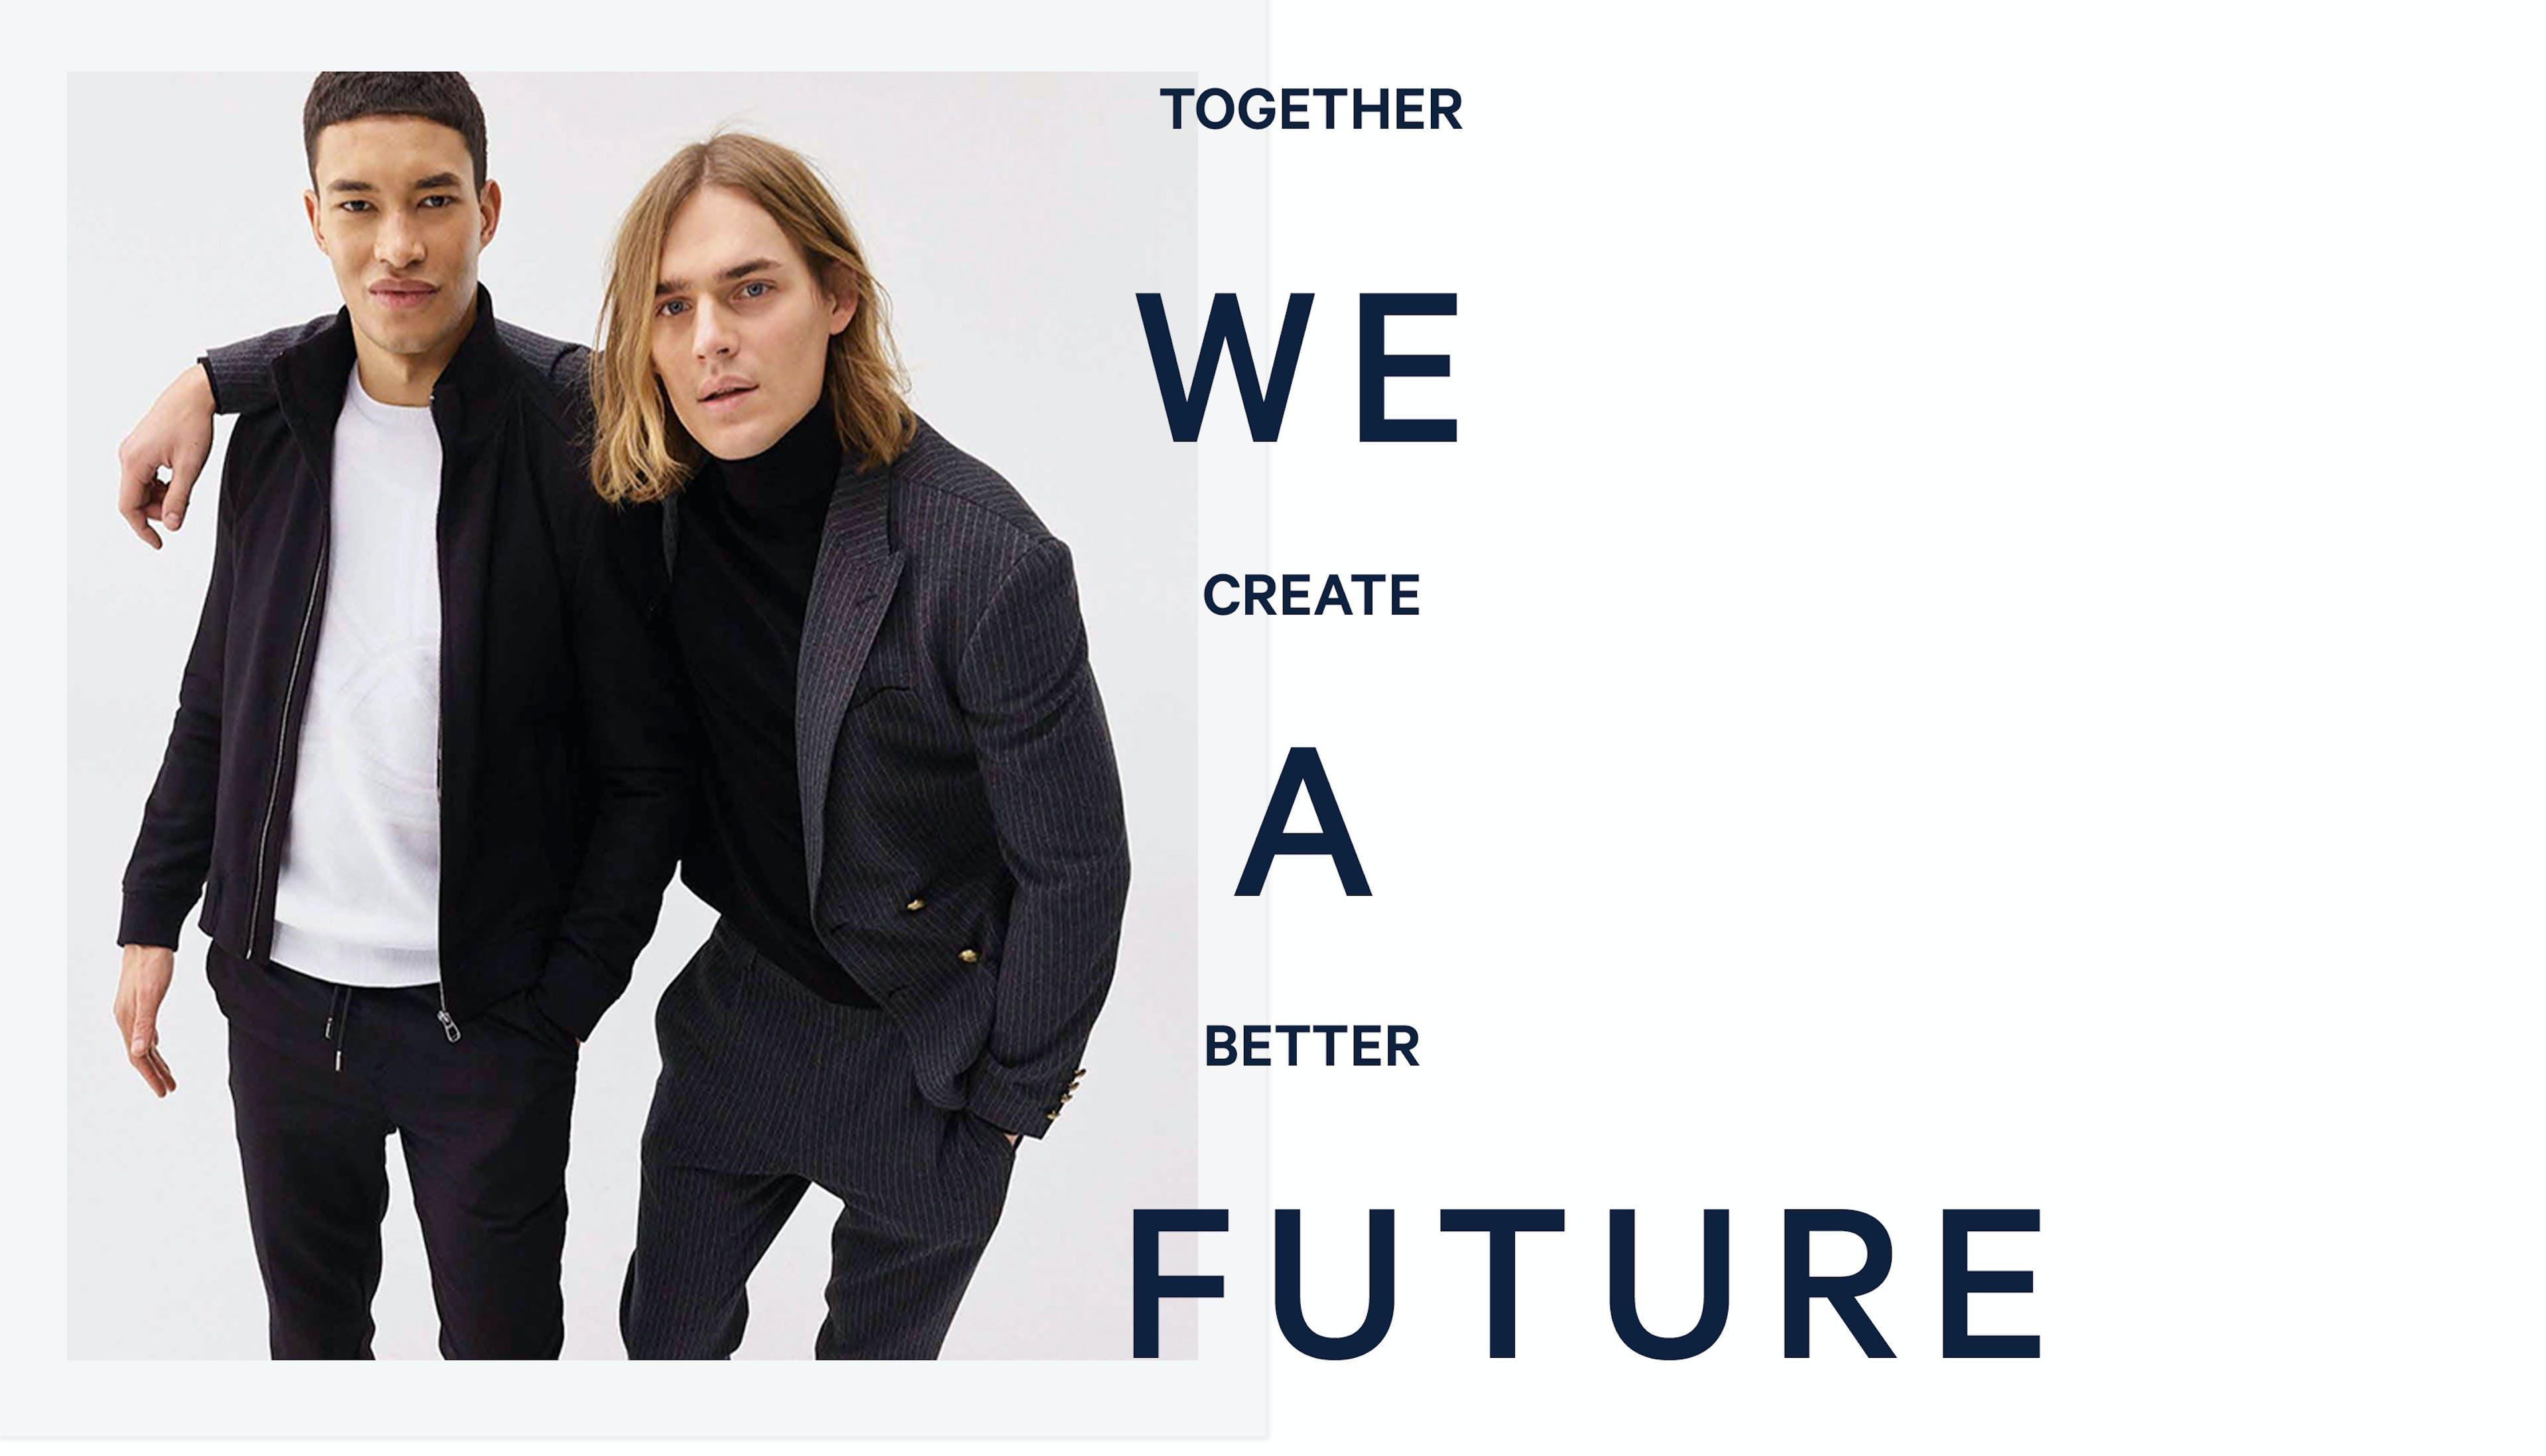 WE CREATE A BETTER FUTURE